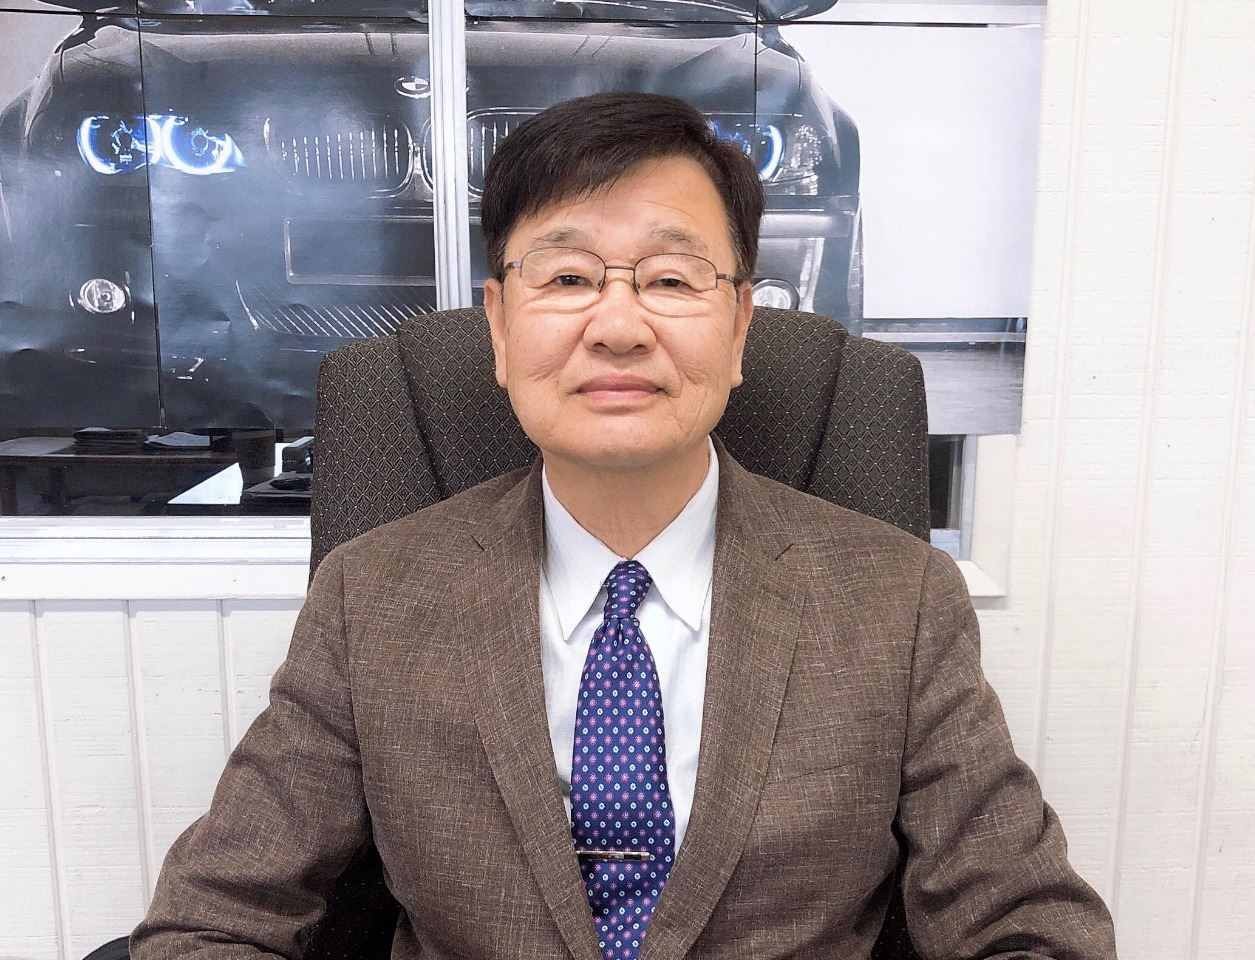 Charles Yi